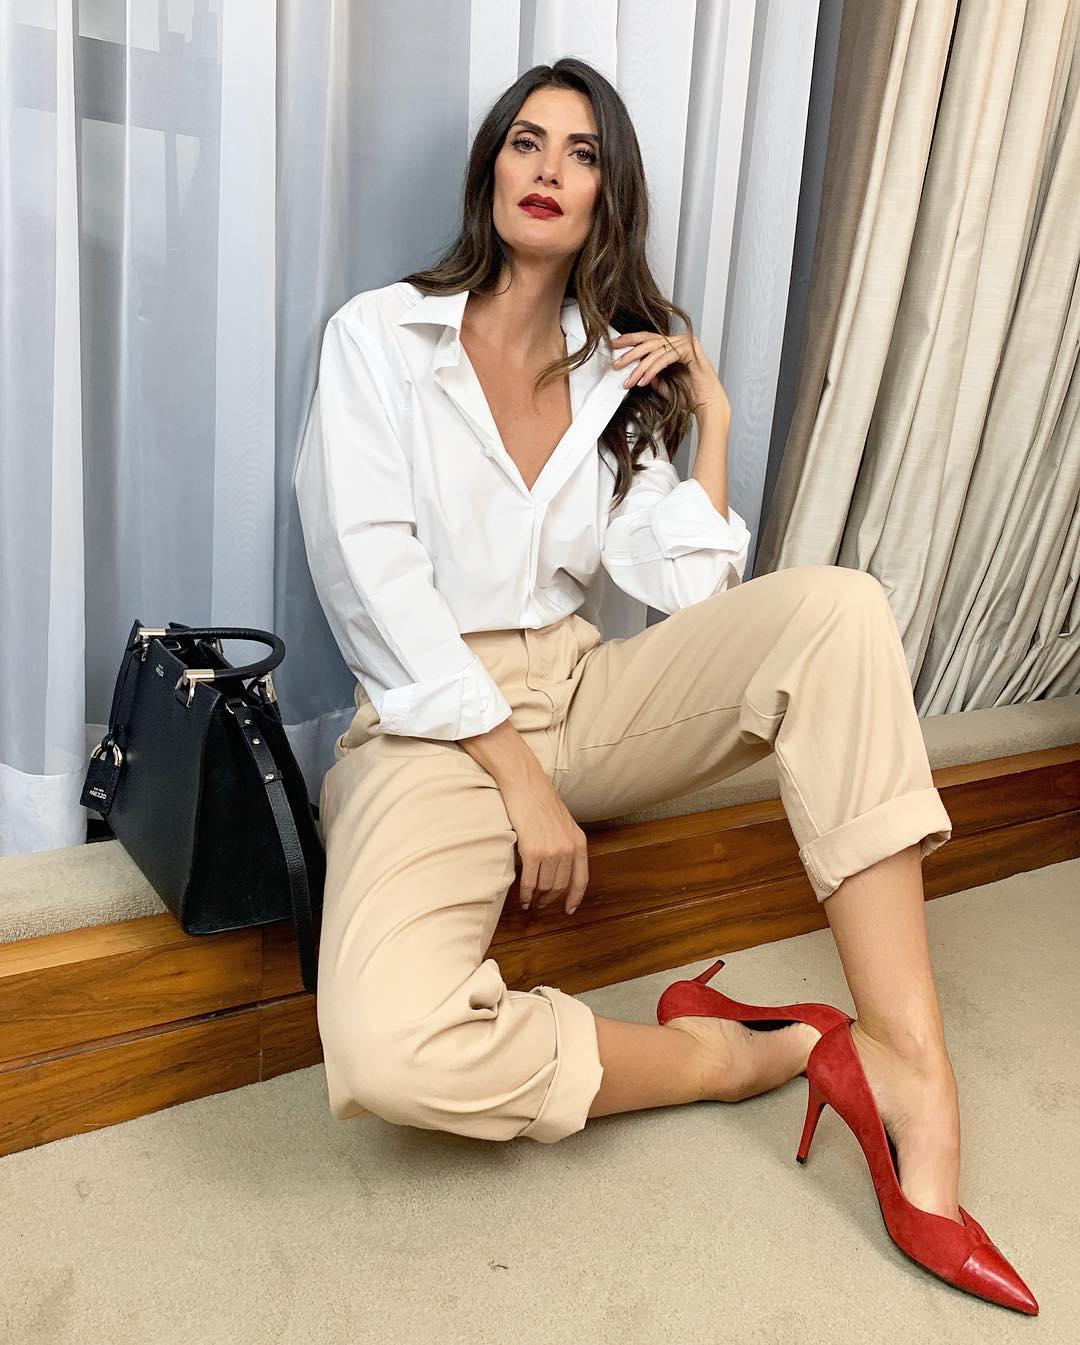 Isabella Fiorentino usa camisa branca e calça bege